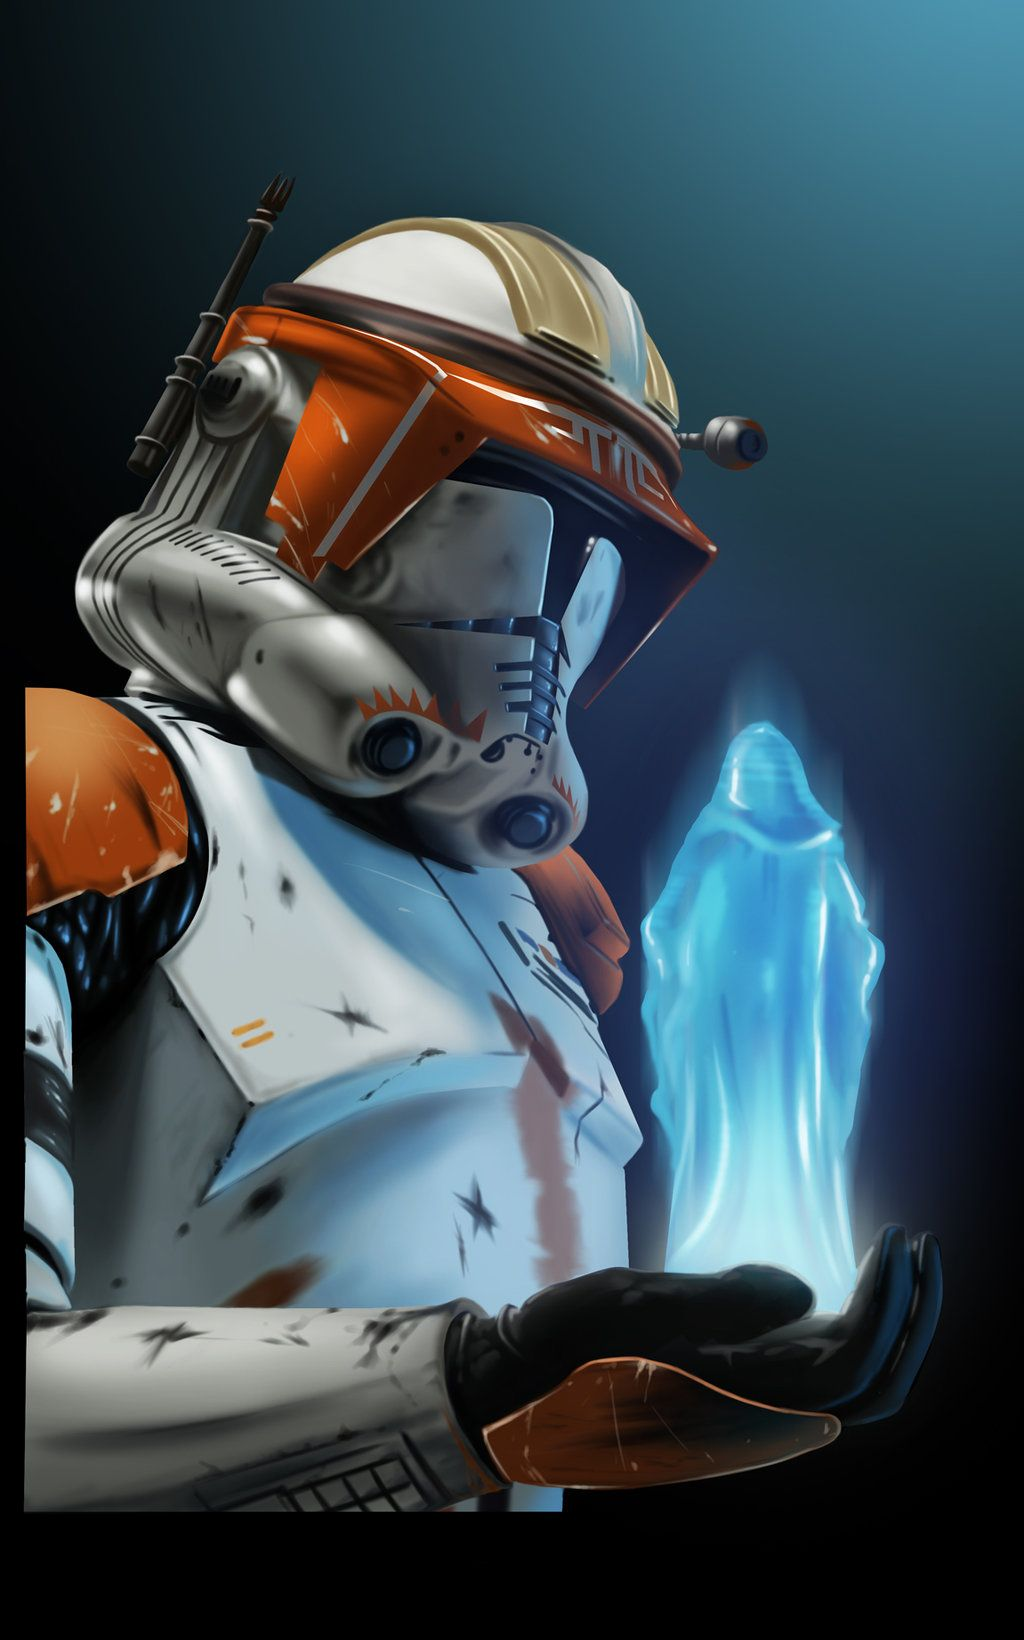 60 Impressive Star Wars Illustrations And Artworks Star Wars Illustration Star Wars Artwork Star Wars Art